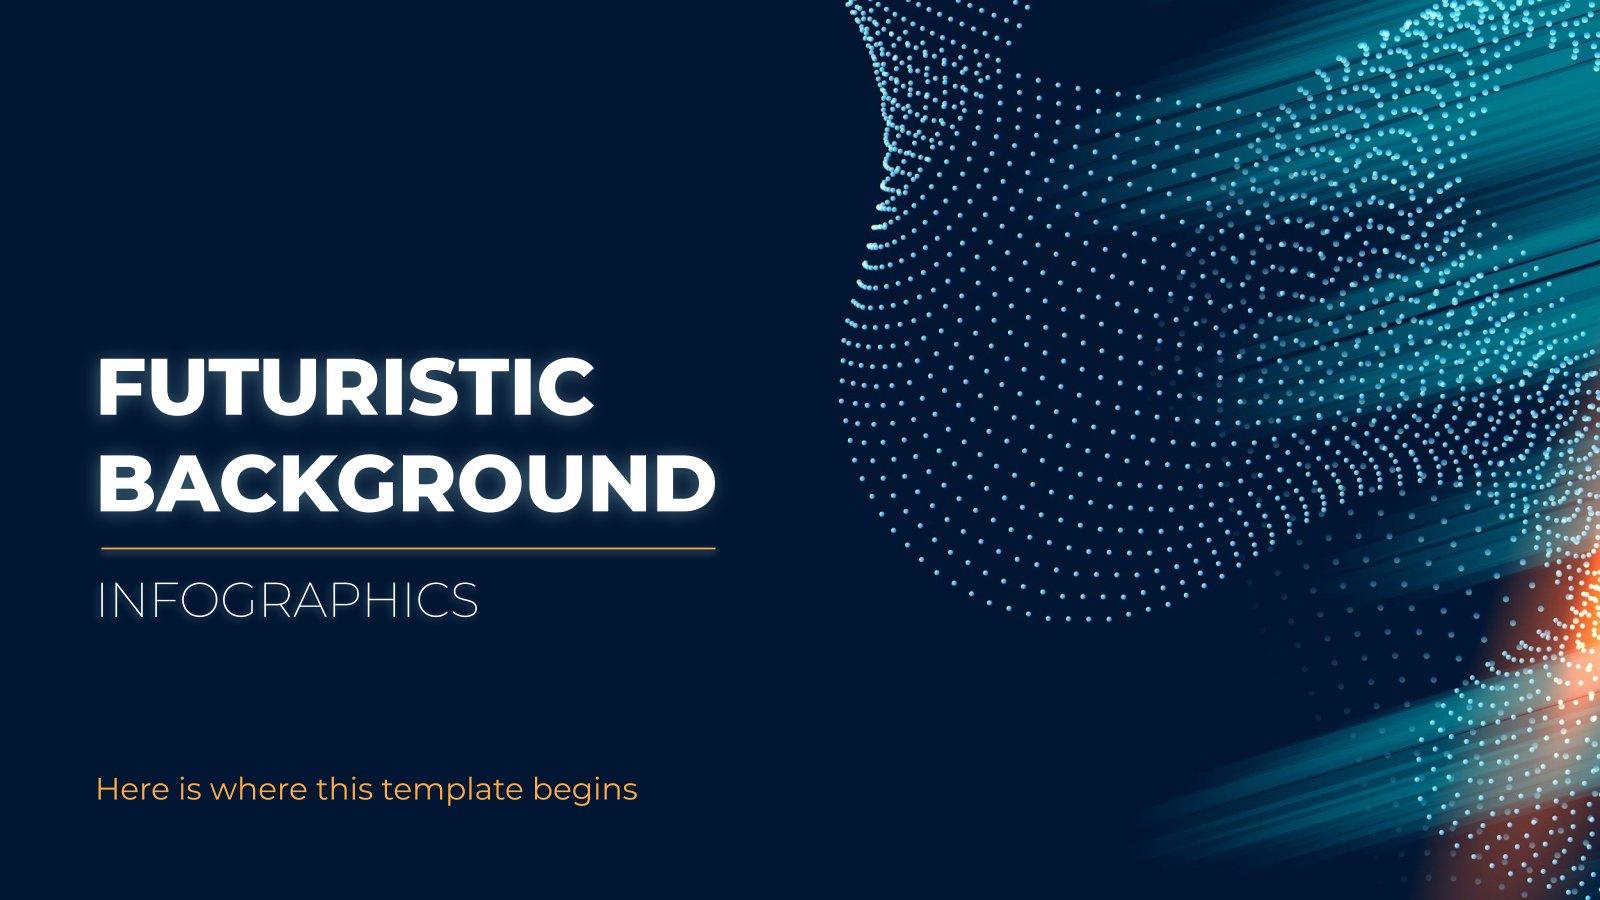 Futuristic Background Infographics presentation template